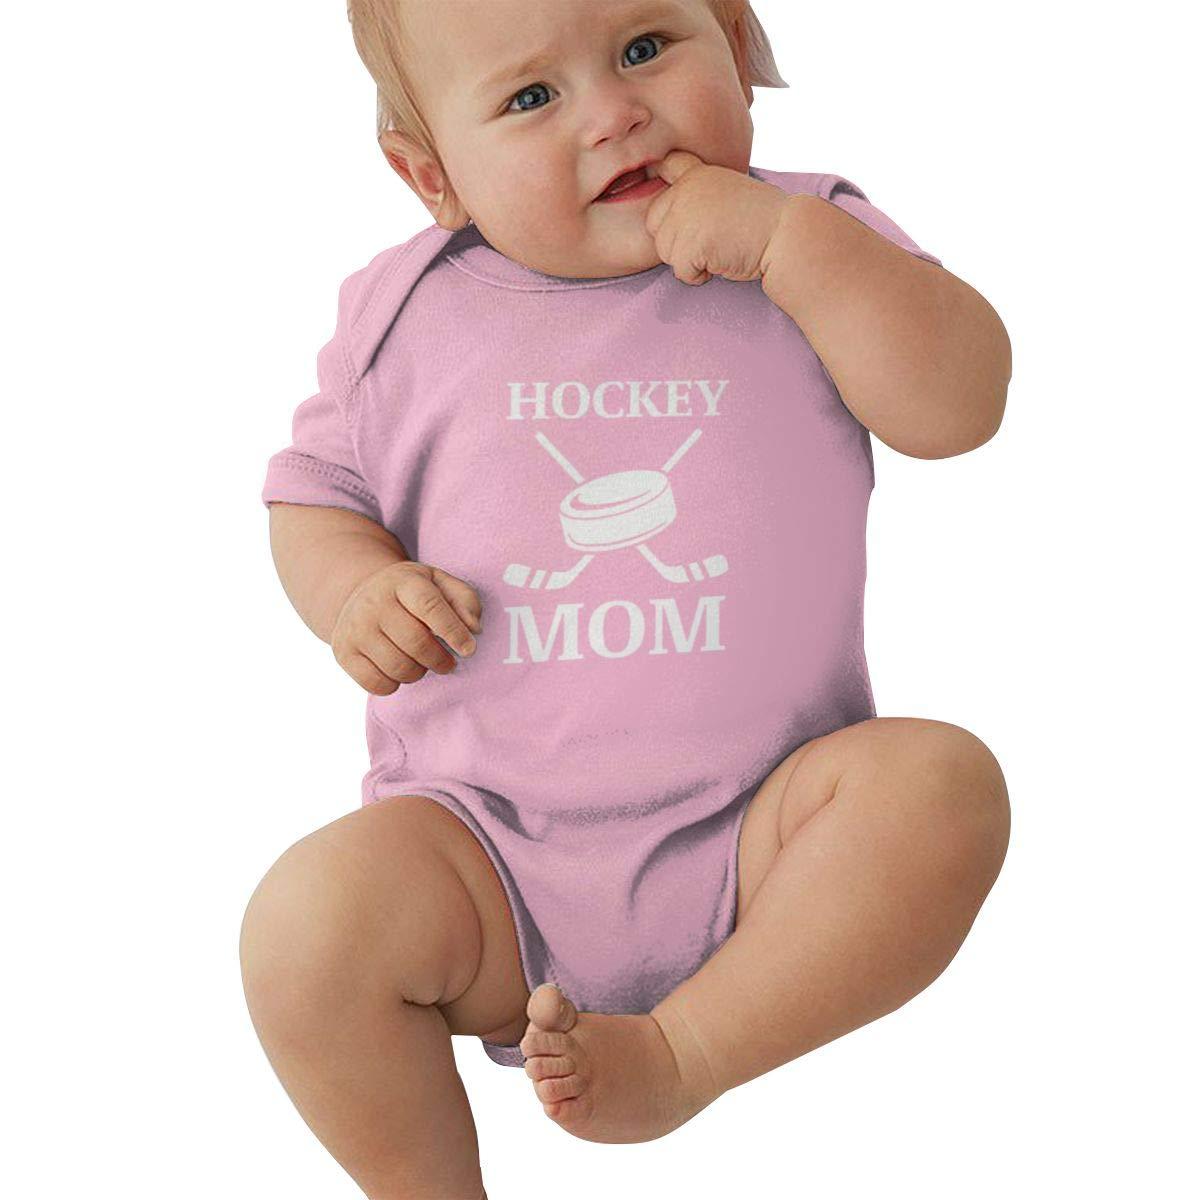 Toddler Baby Girls Bodysuit Short-Sleeve Onesie Hockey Mom Hockey AABB Print Outfit